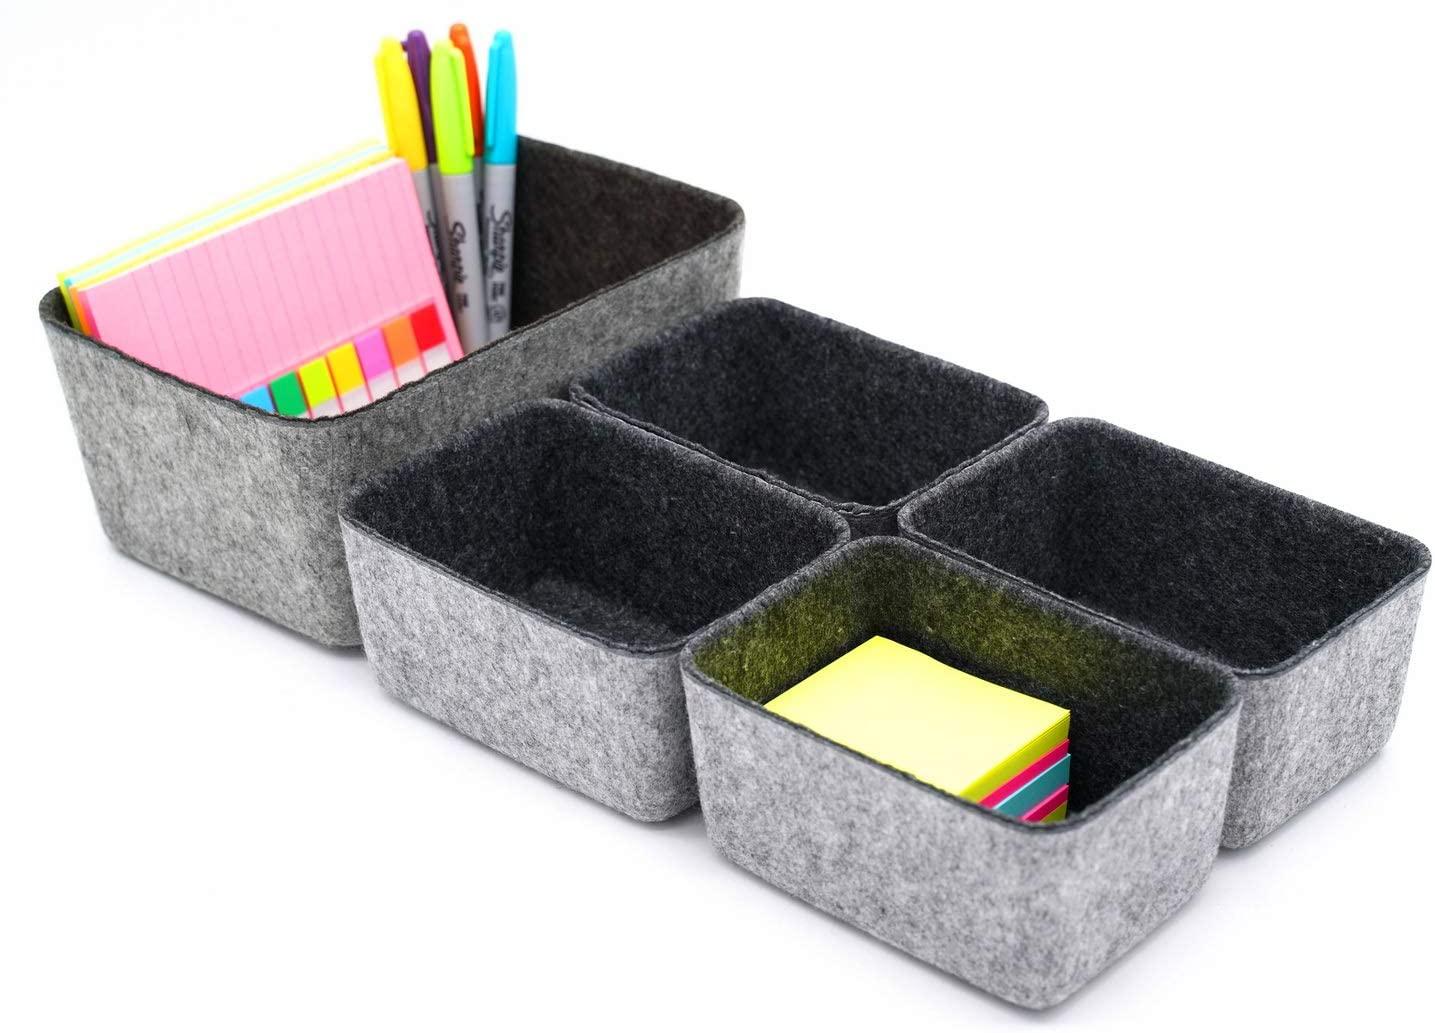 Welaxy Drawer organizers dividers storage bins office organizer bin pack of 5 (Charcoal)